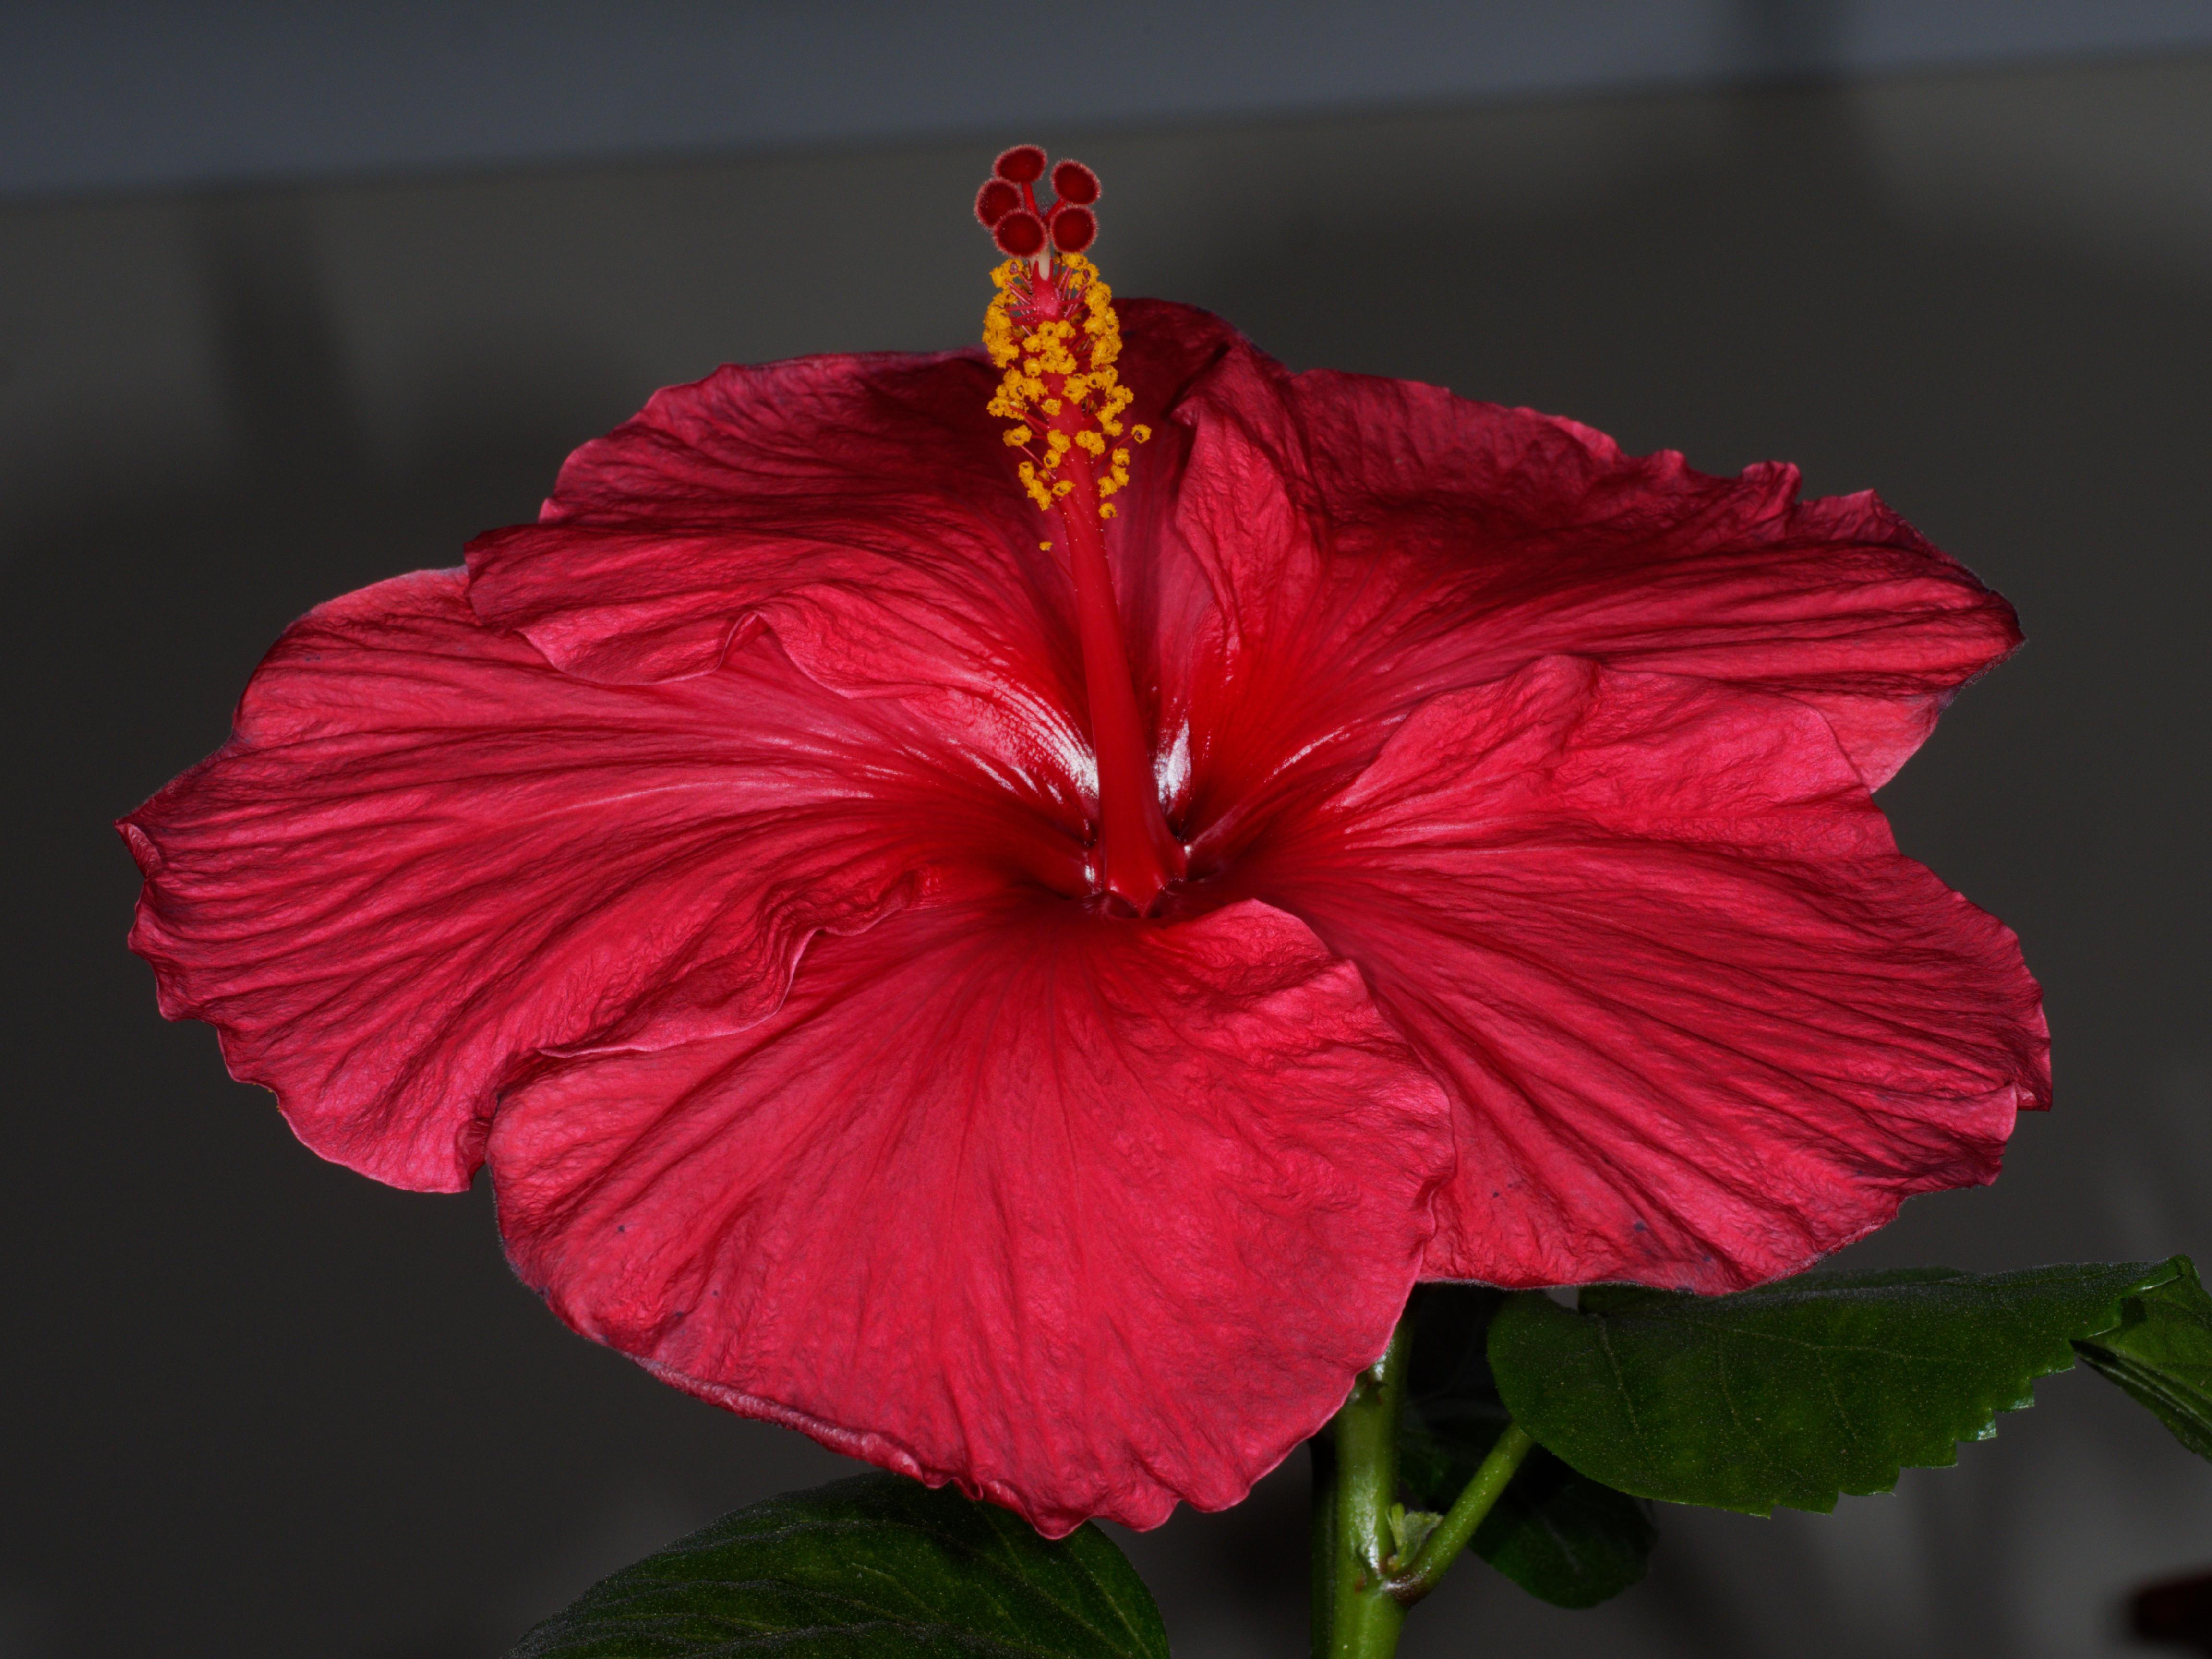 Hibiscus-STF-8-1.jpeg